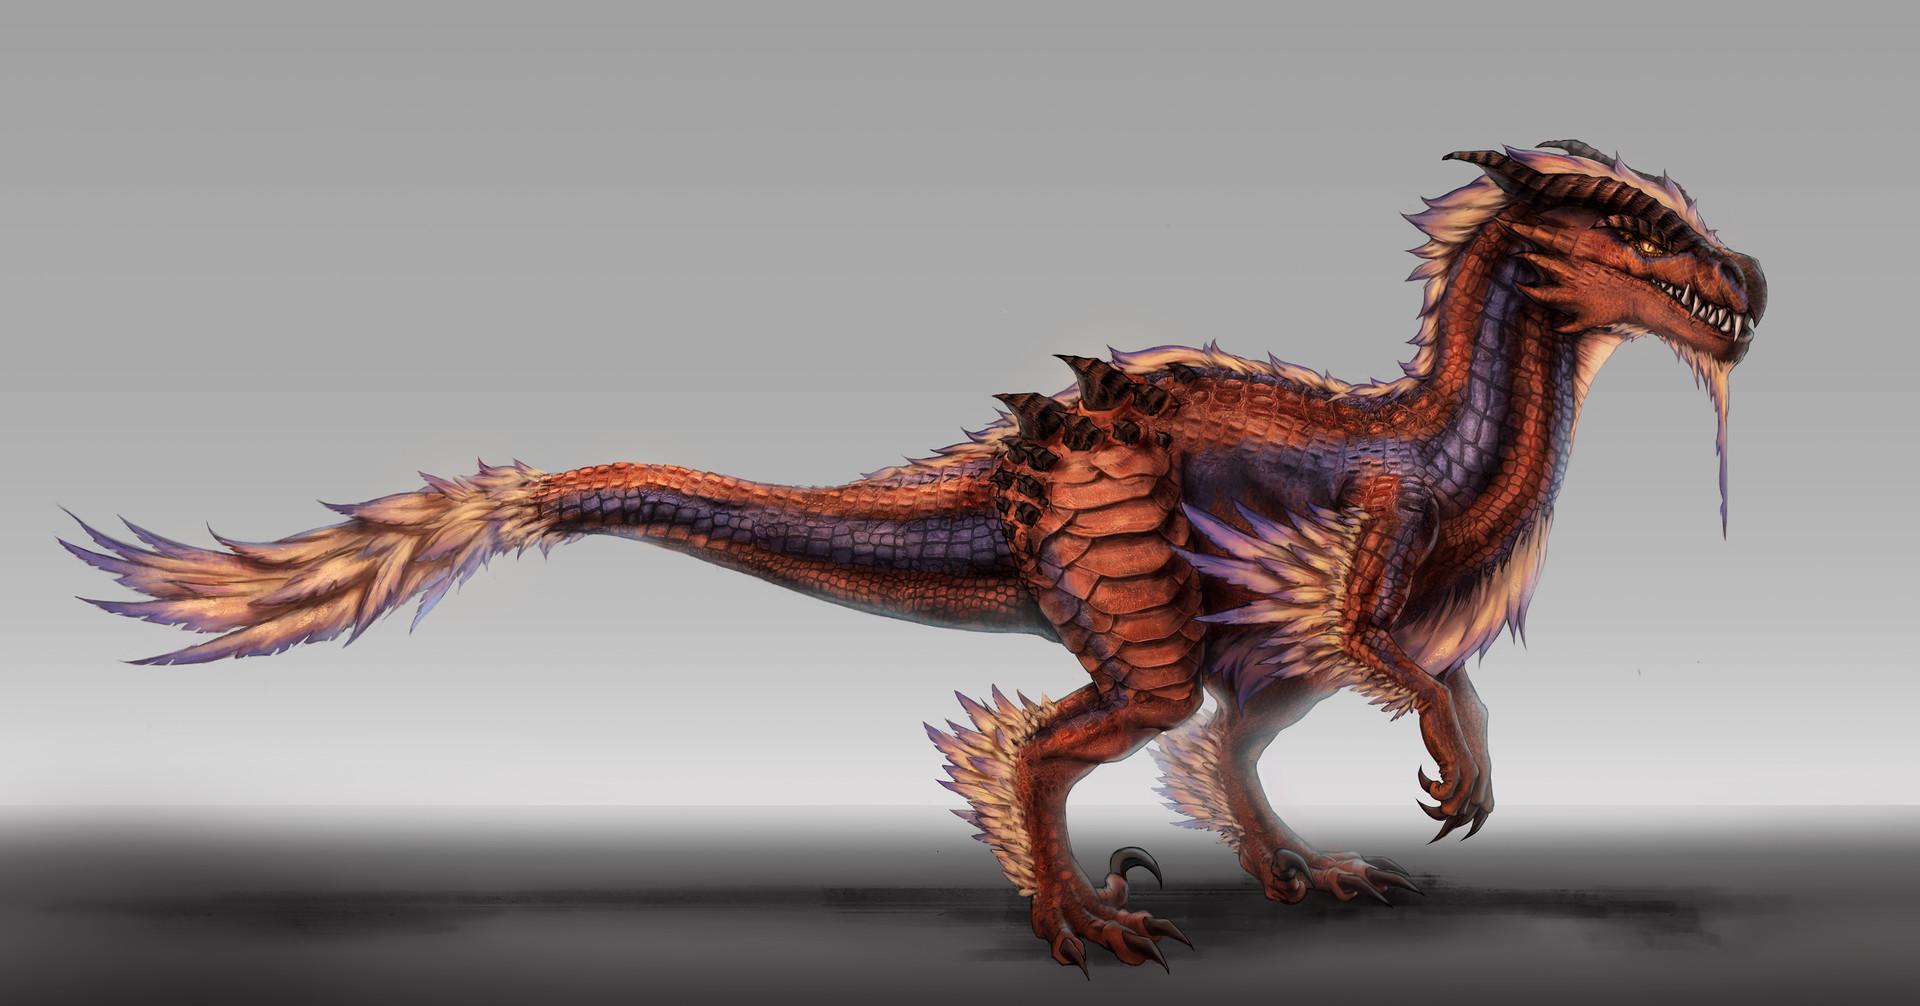 Emelie johansson raptor concepts smaller